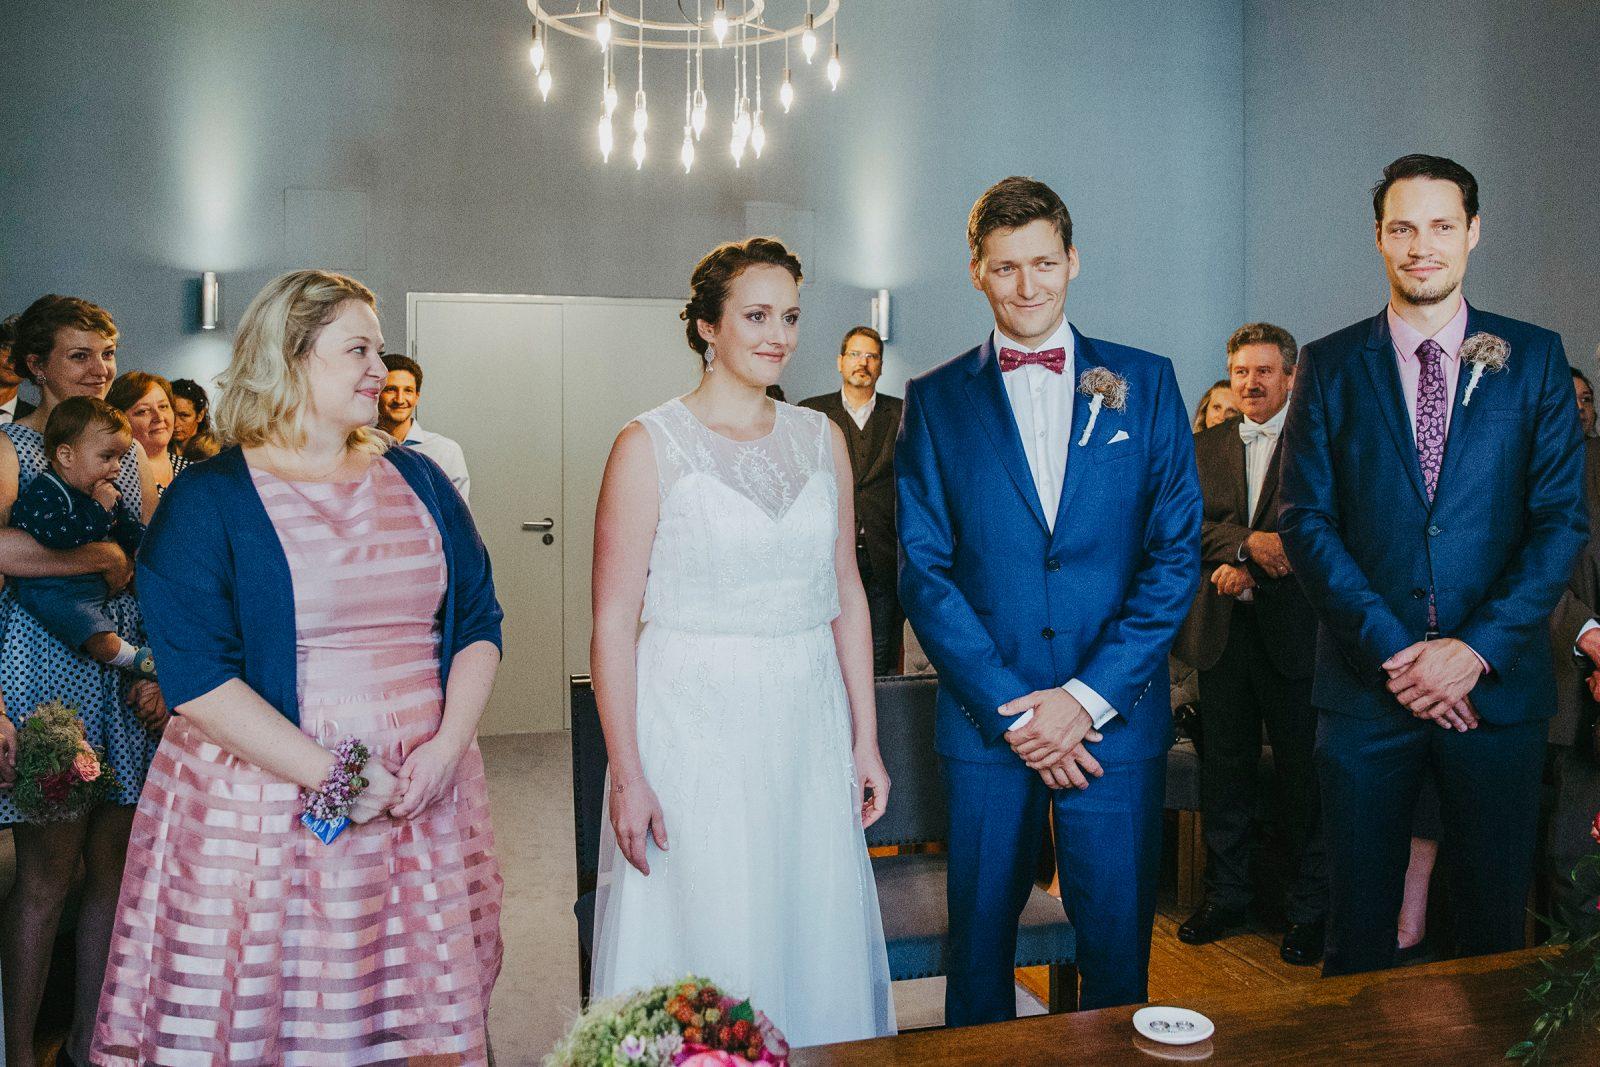 Hochzeit_Potsdam_fotograf_G8